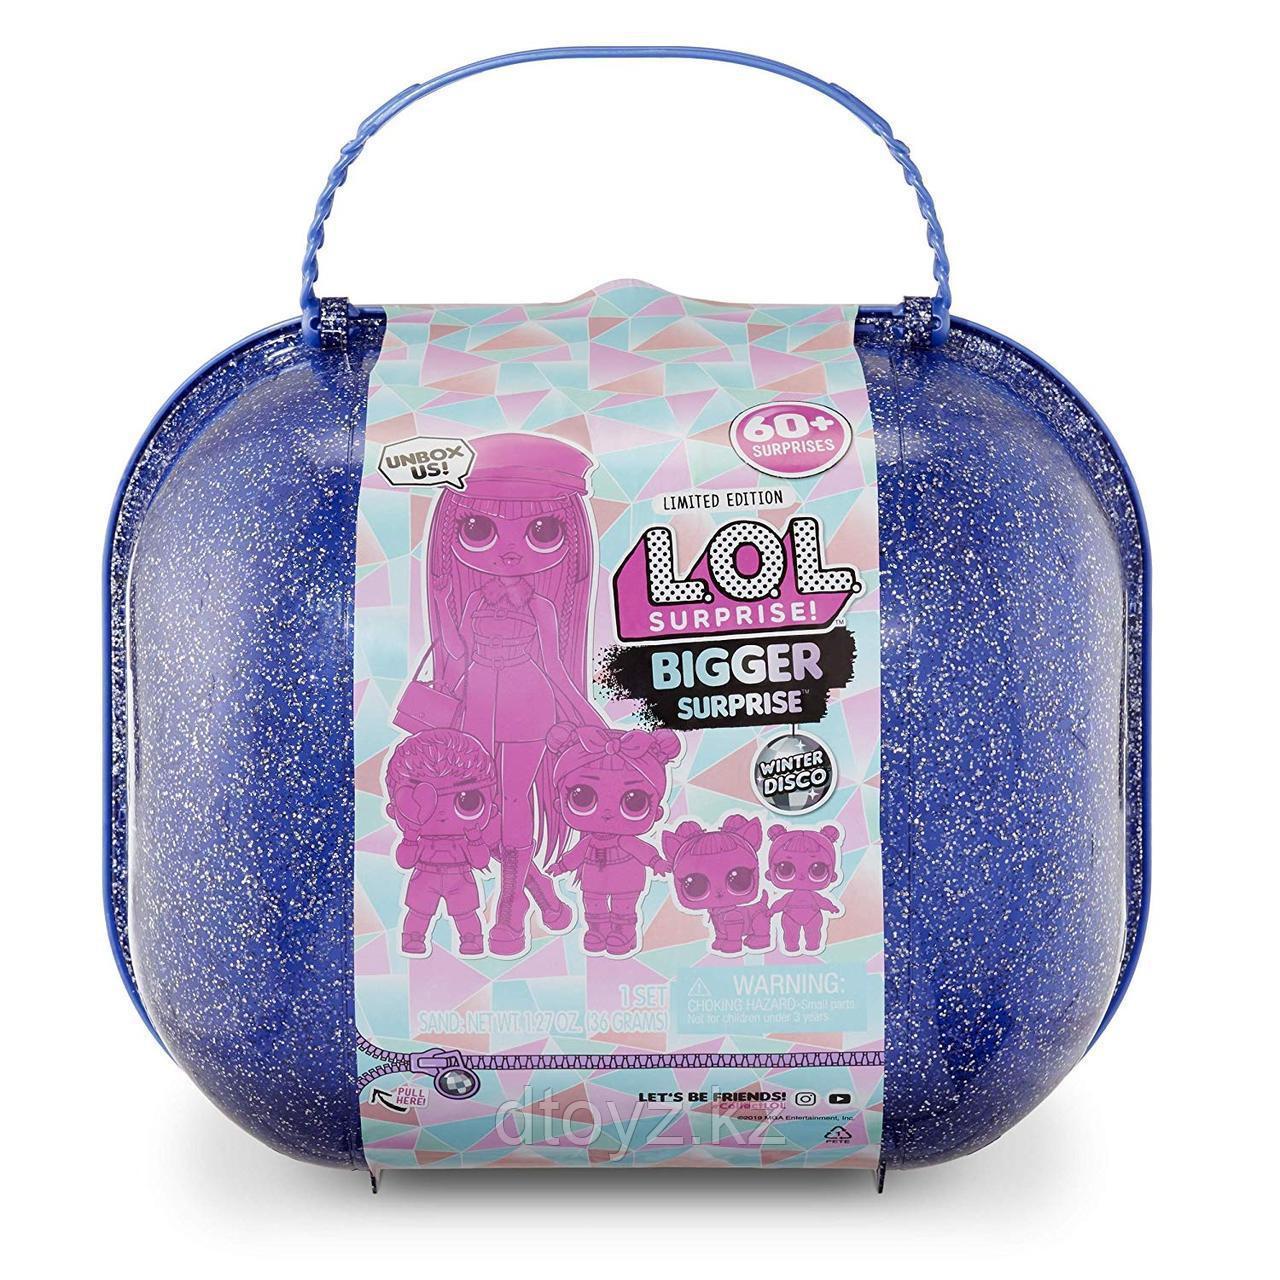 LOL Surprise! Winter Disco Bigger Surprise огромный сюрприз ЛОЛ!